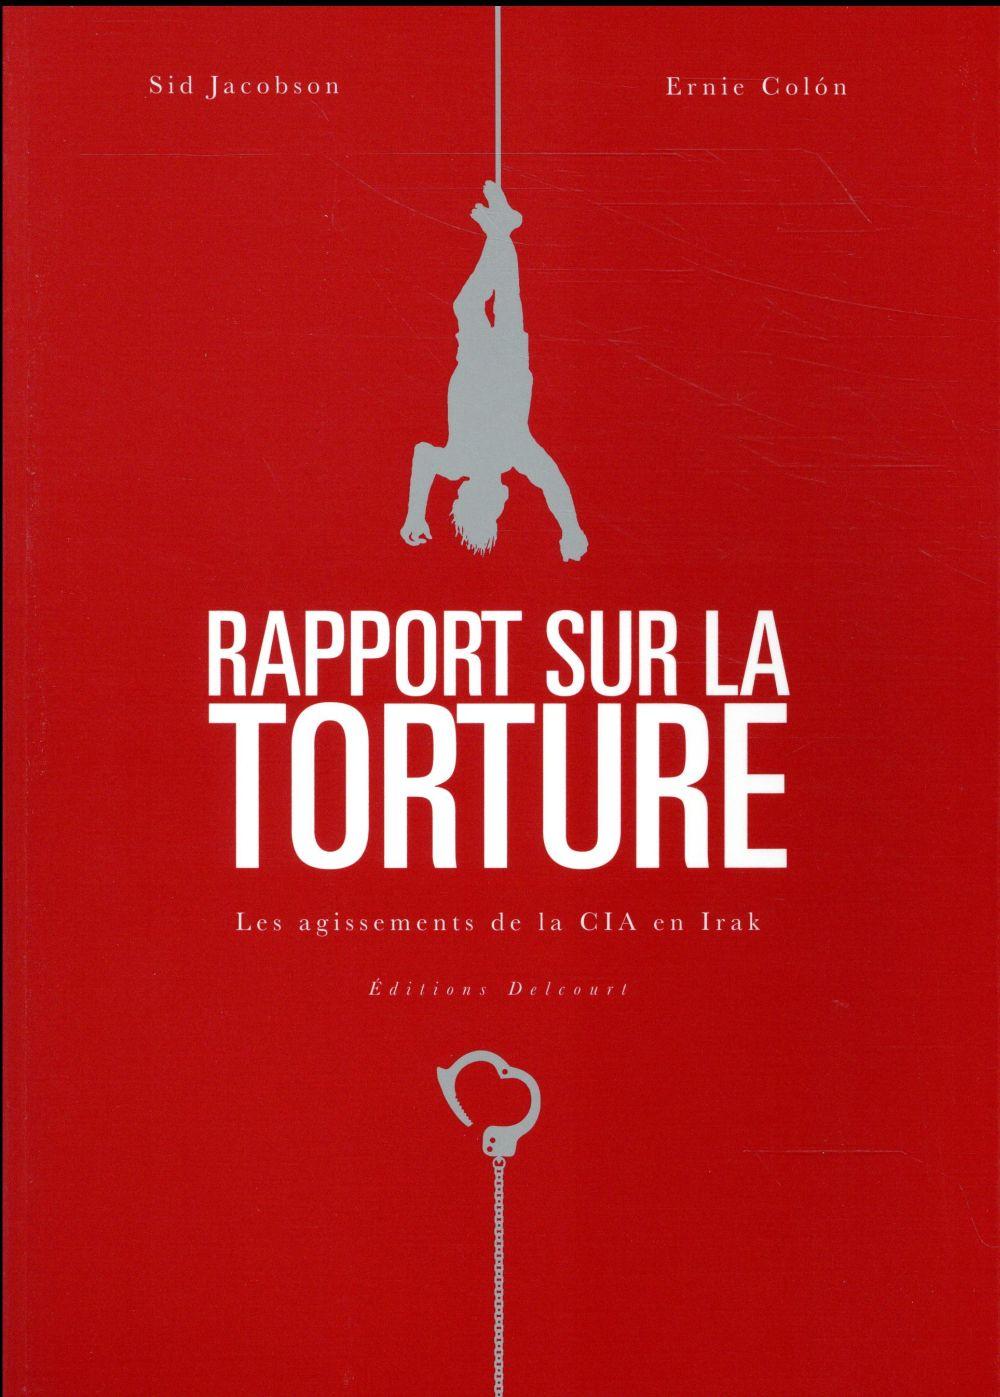 Rapport sur la torture ; les agissements de la CIA en Irak